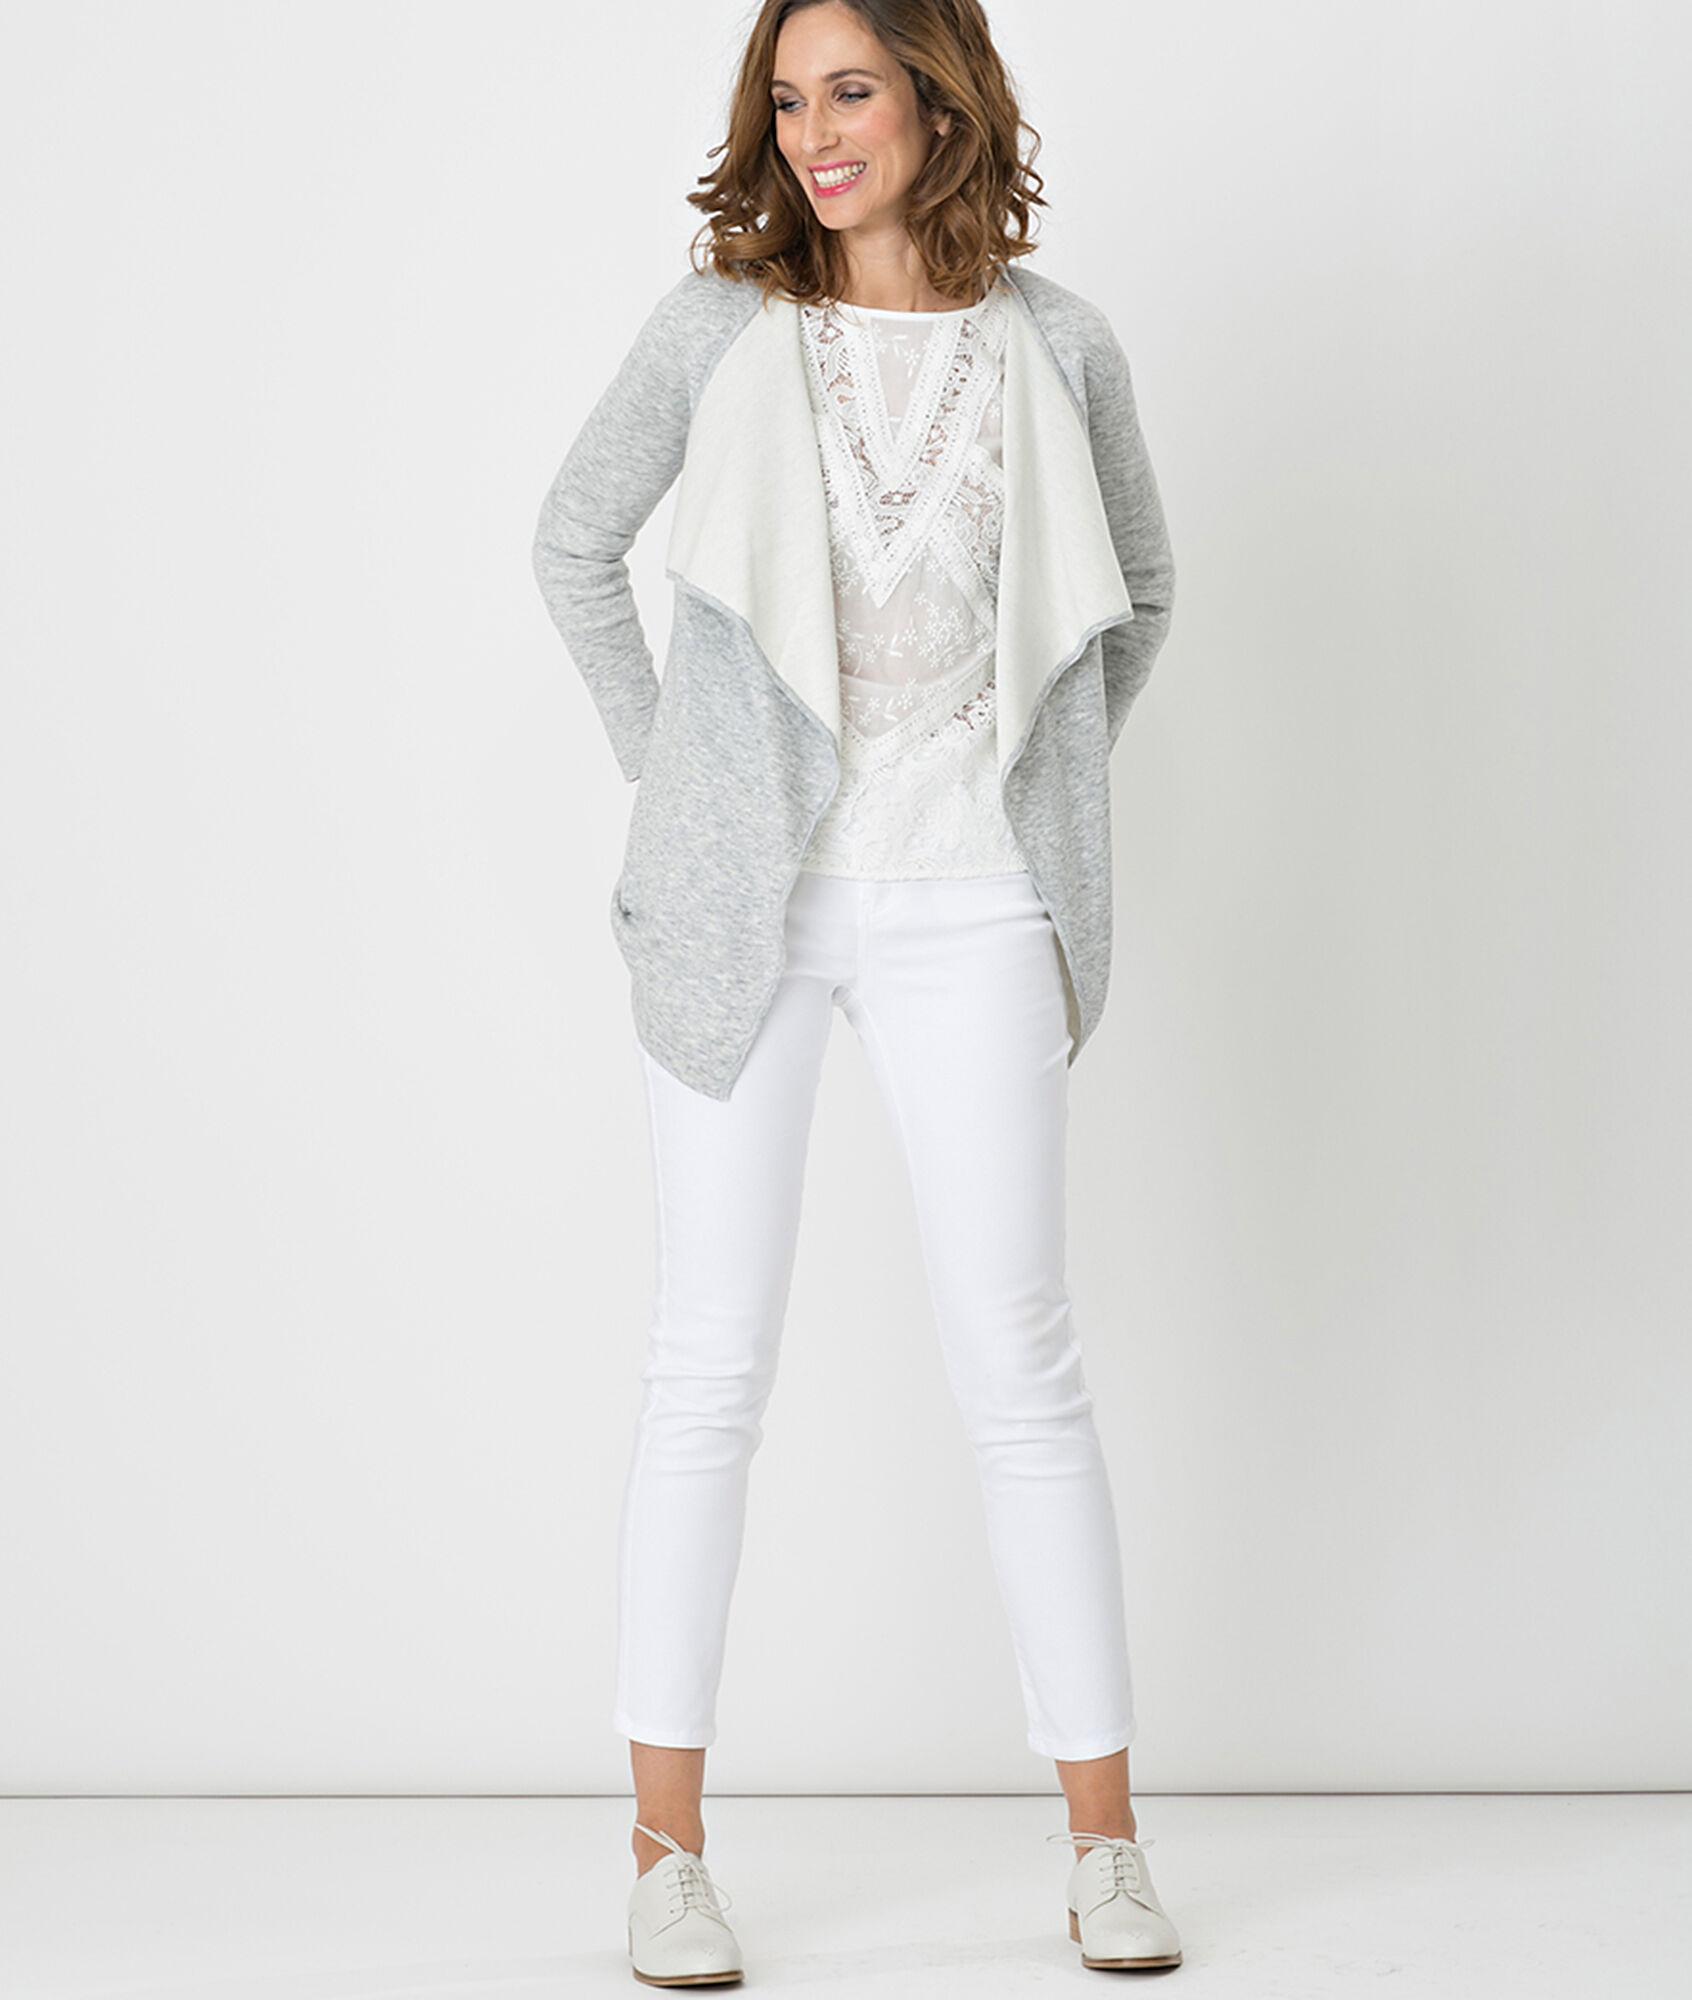 Blanc Pantalon 8 7 Blanc pantalon Nahal Pour Femme Ditla QoWrCBedx